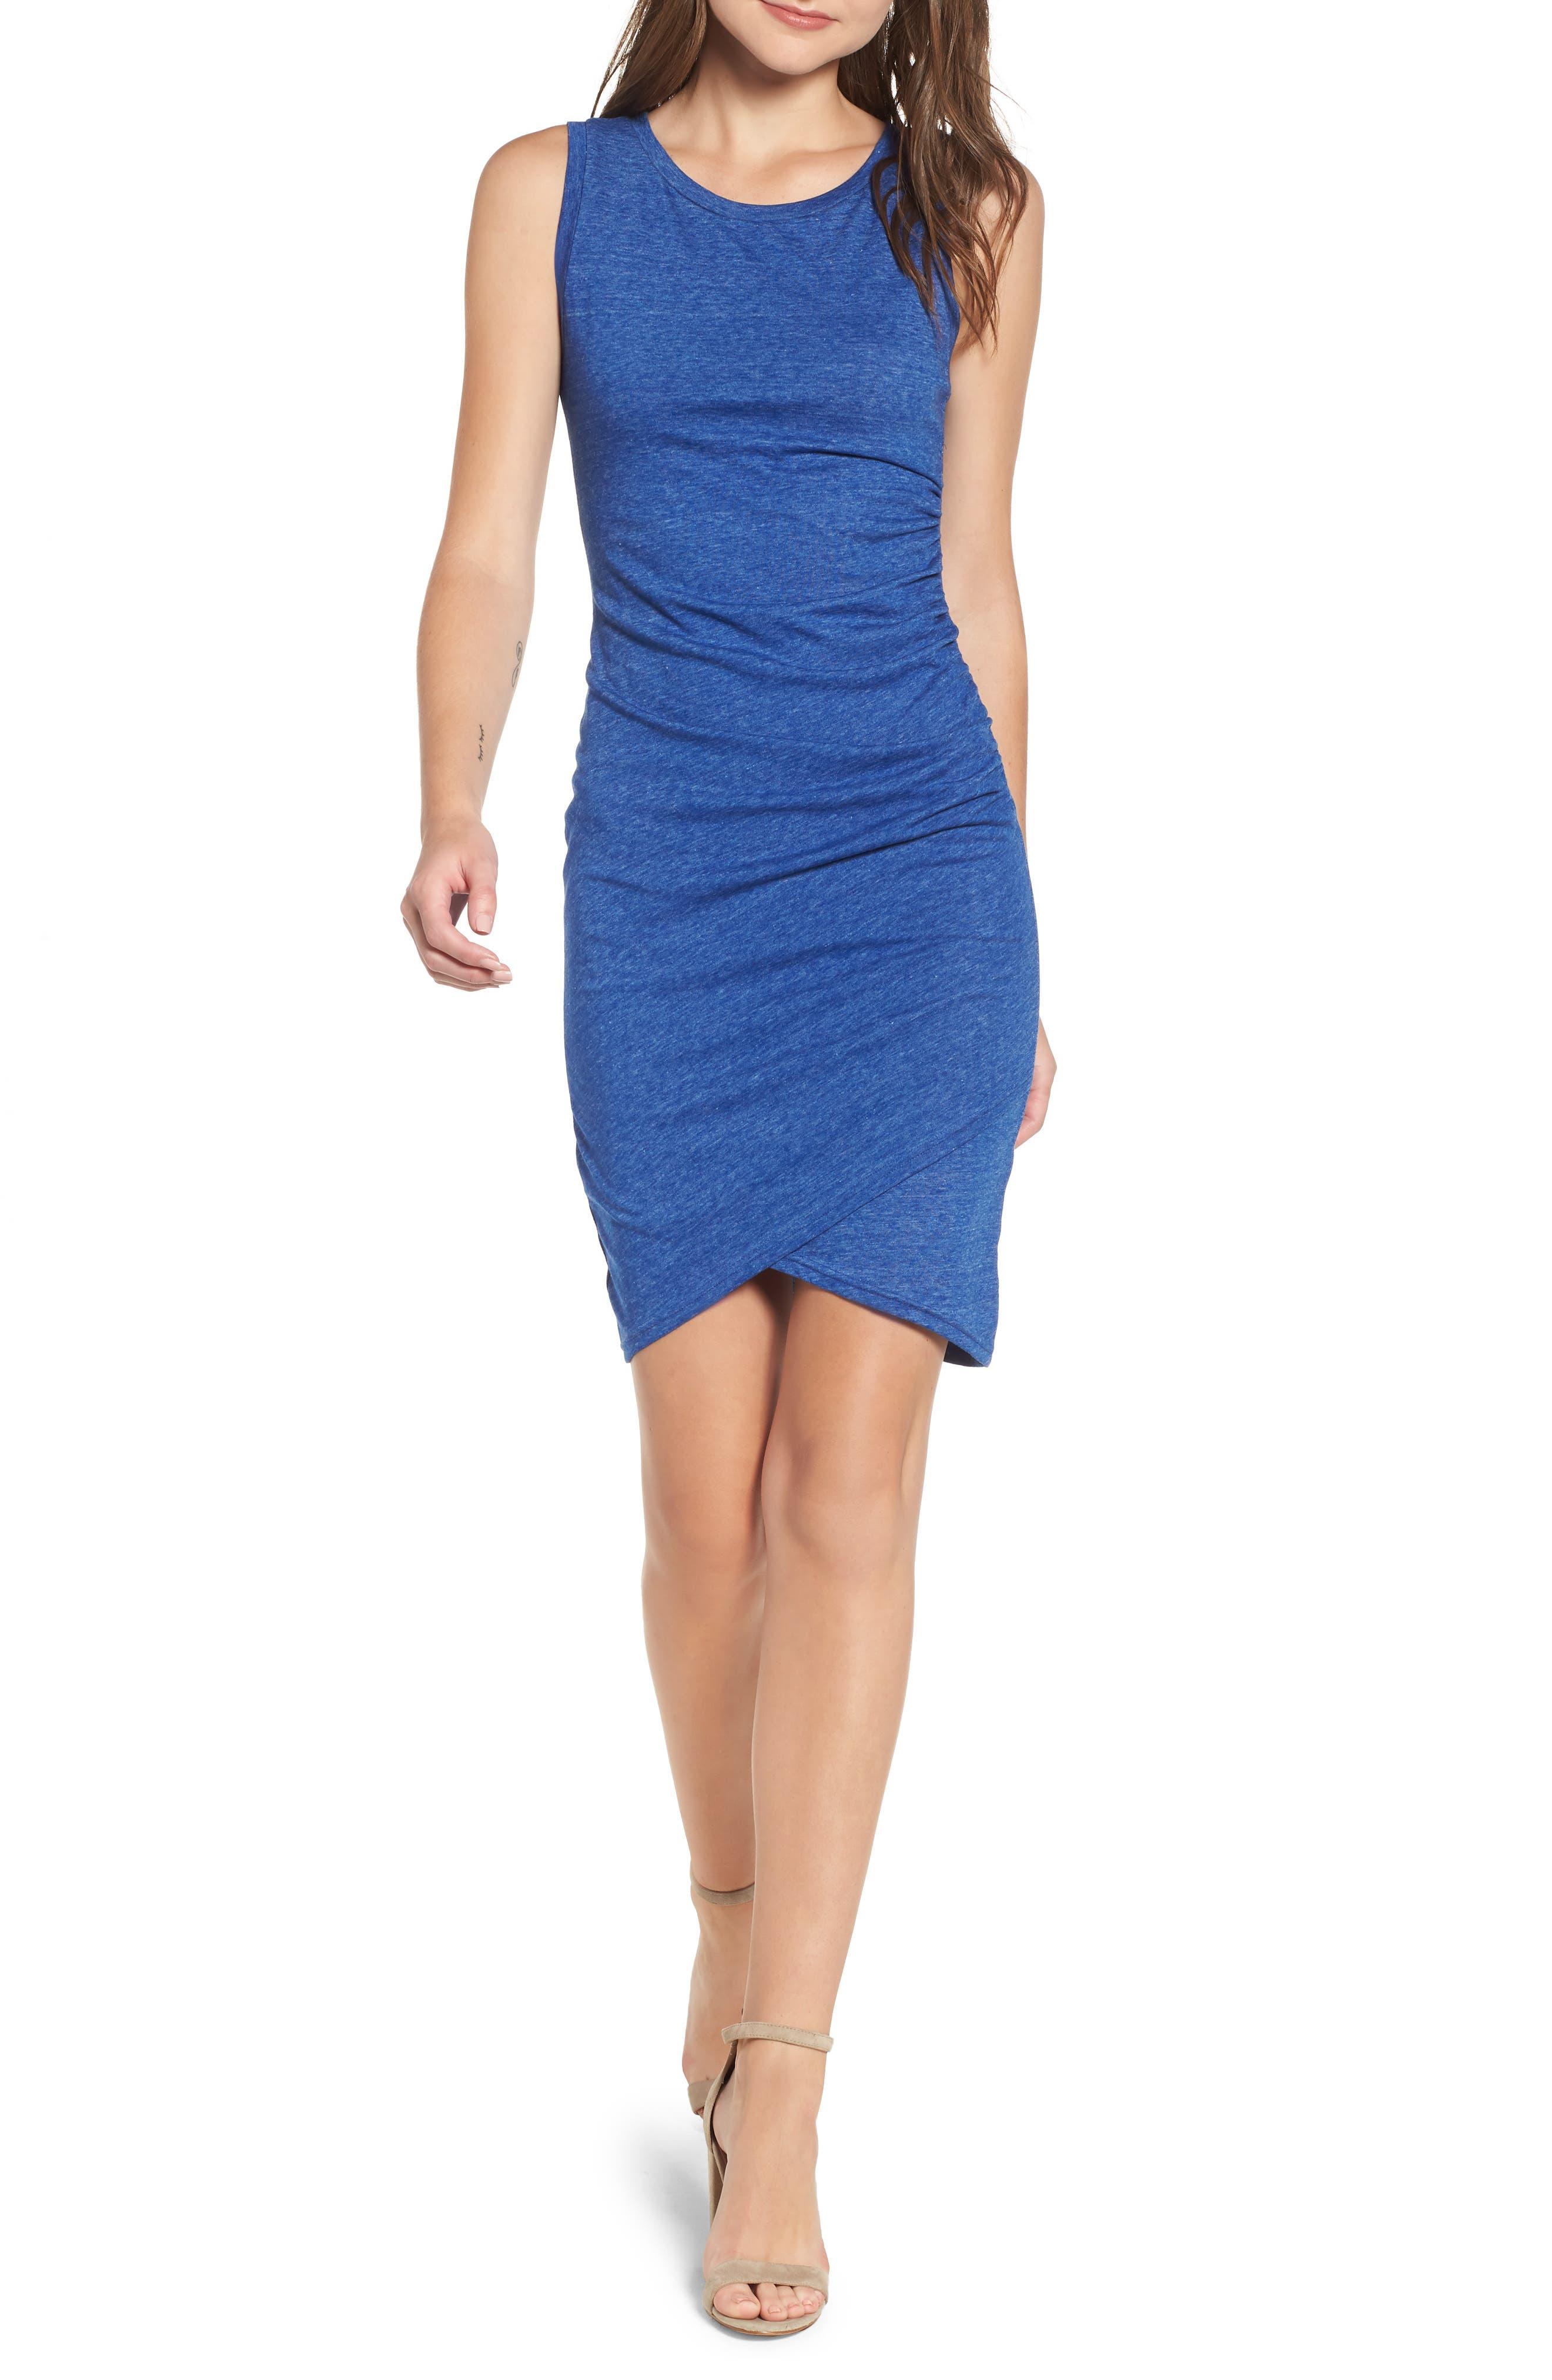 Ruched Body-Con Tank Dress,                         Main,                         color, Blue Mazarine Hthr